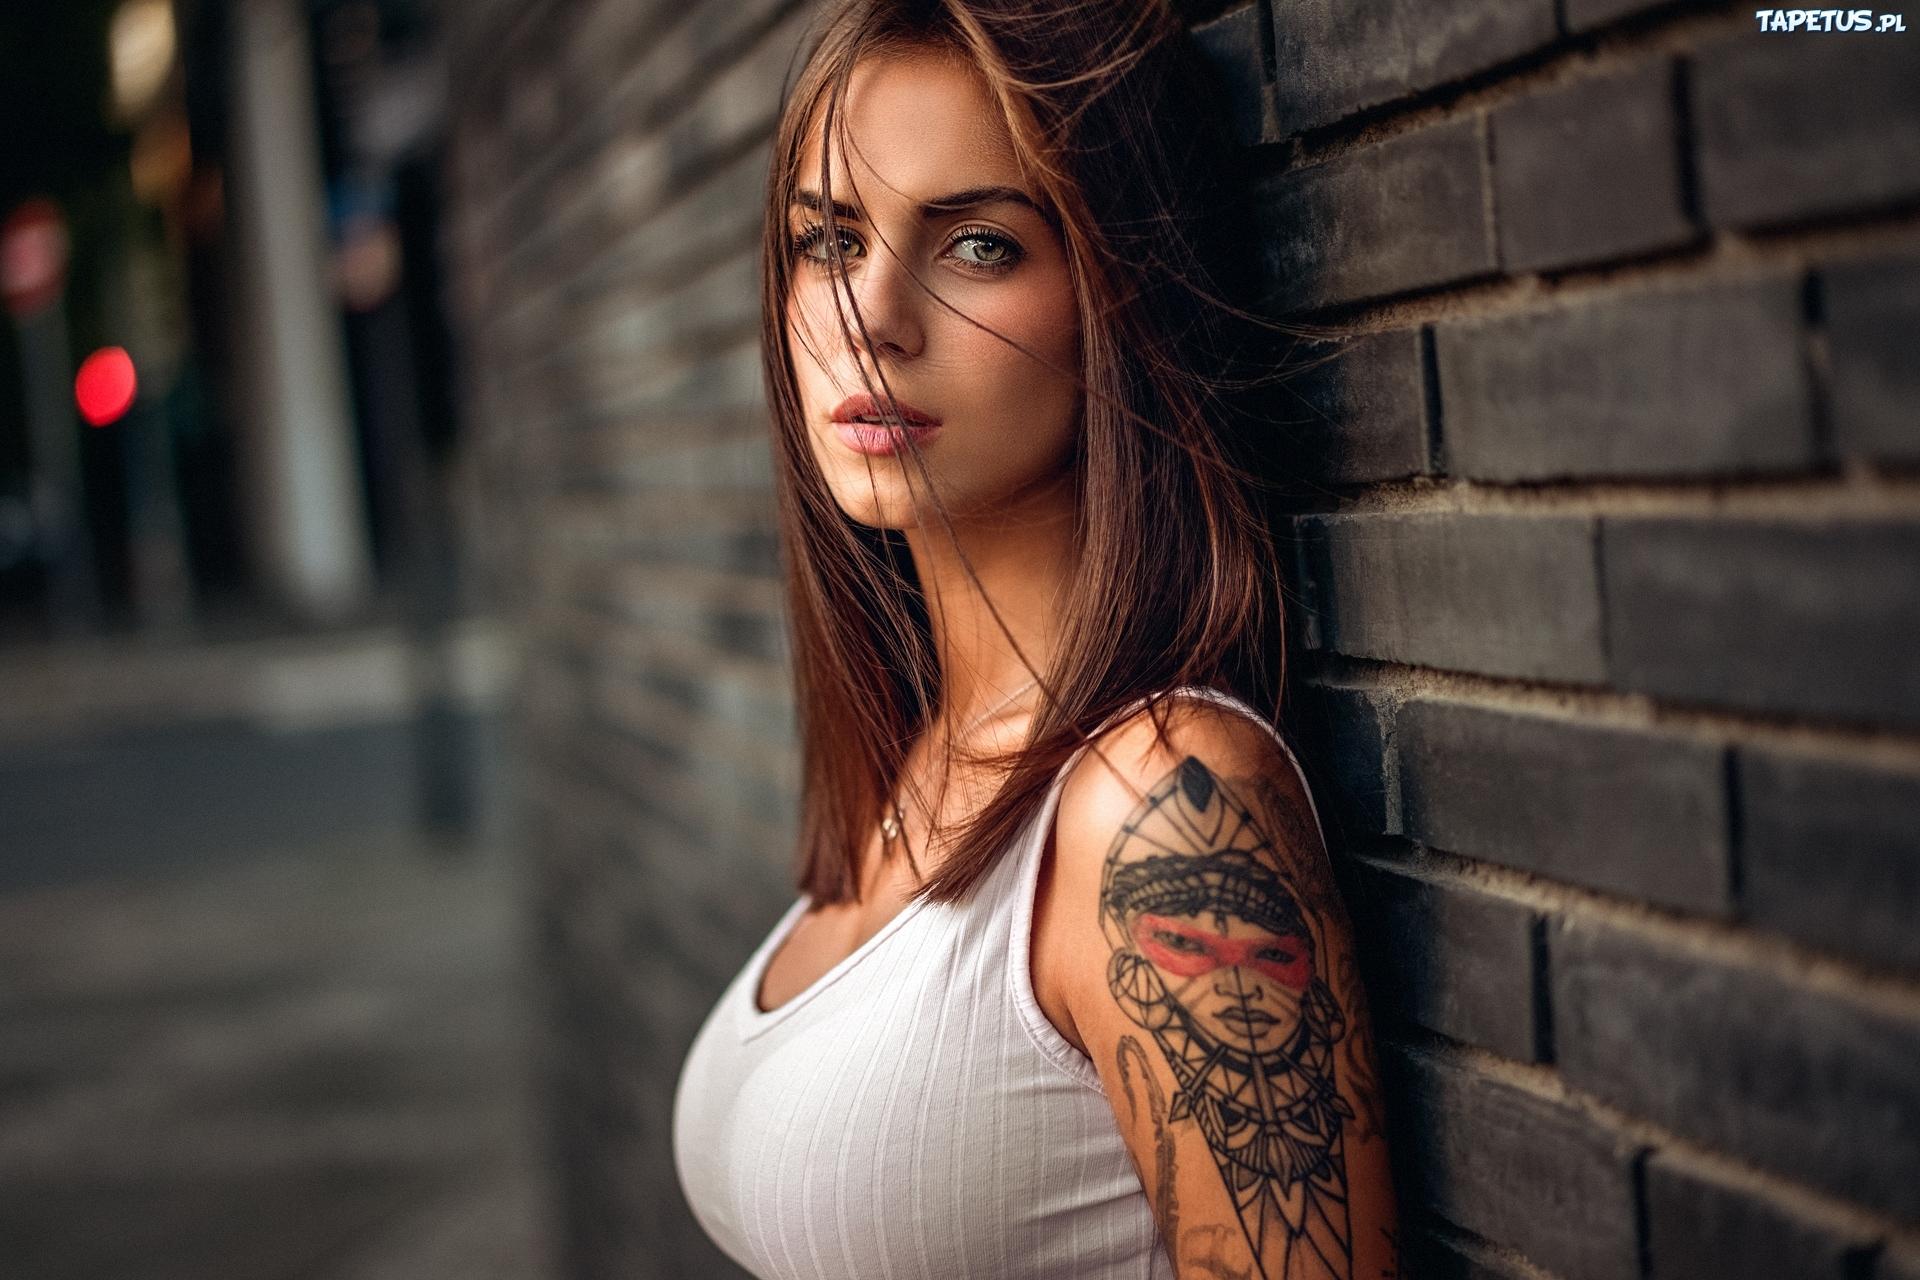 Kobieta Twarz Tatuaż